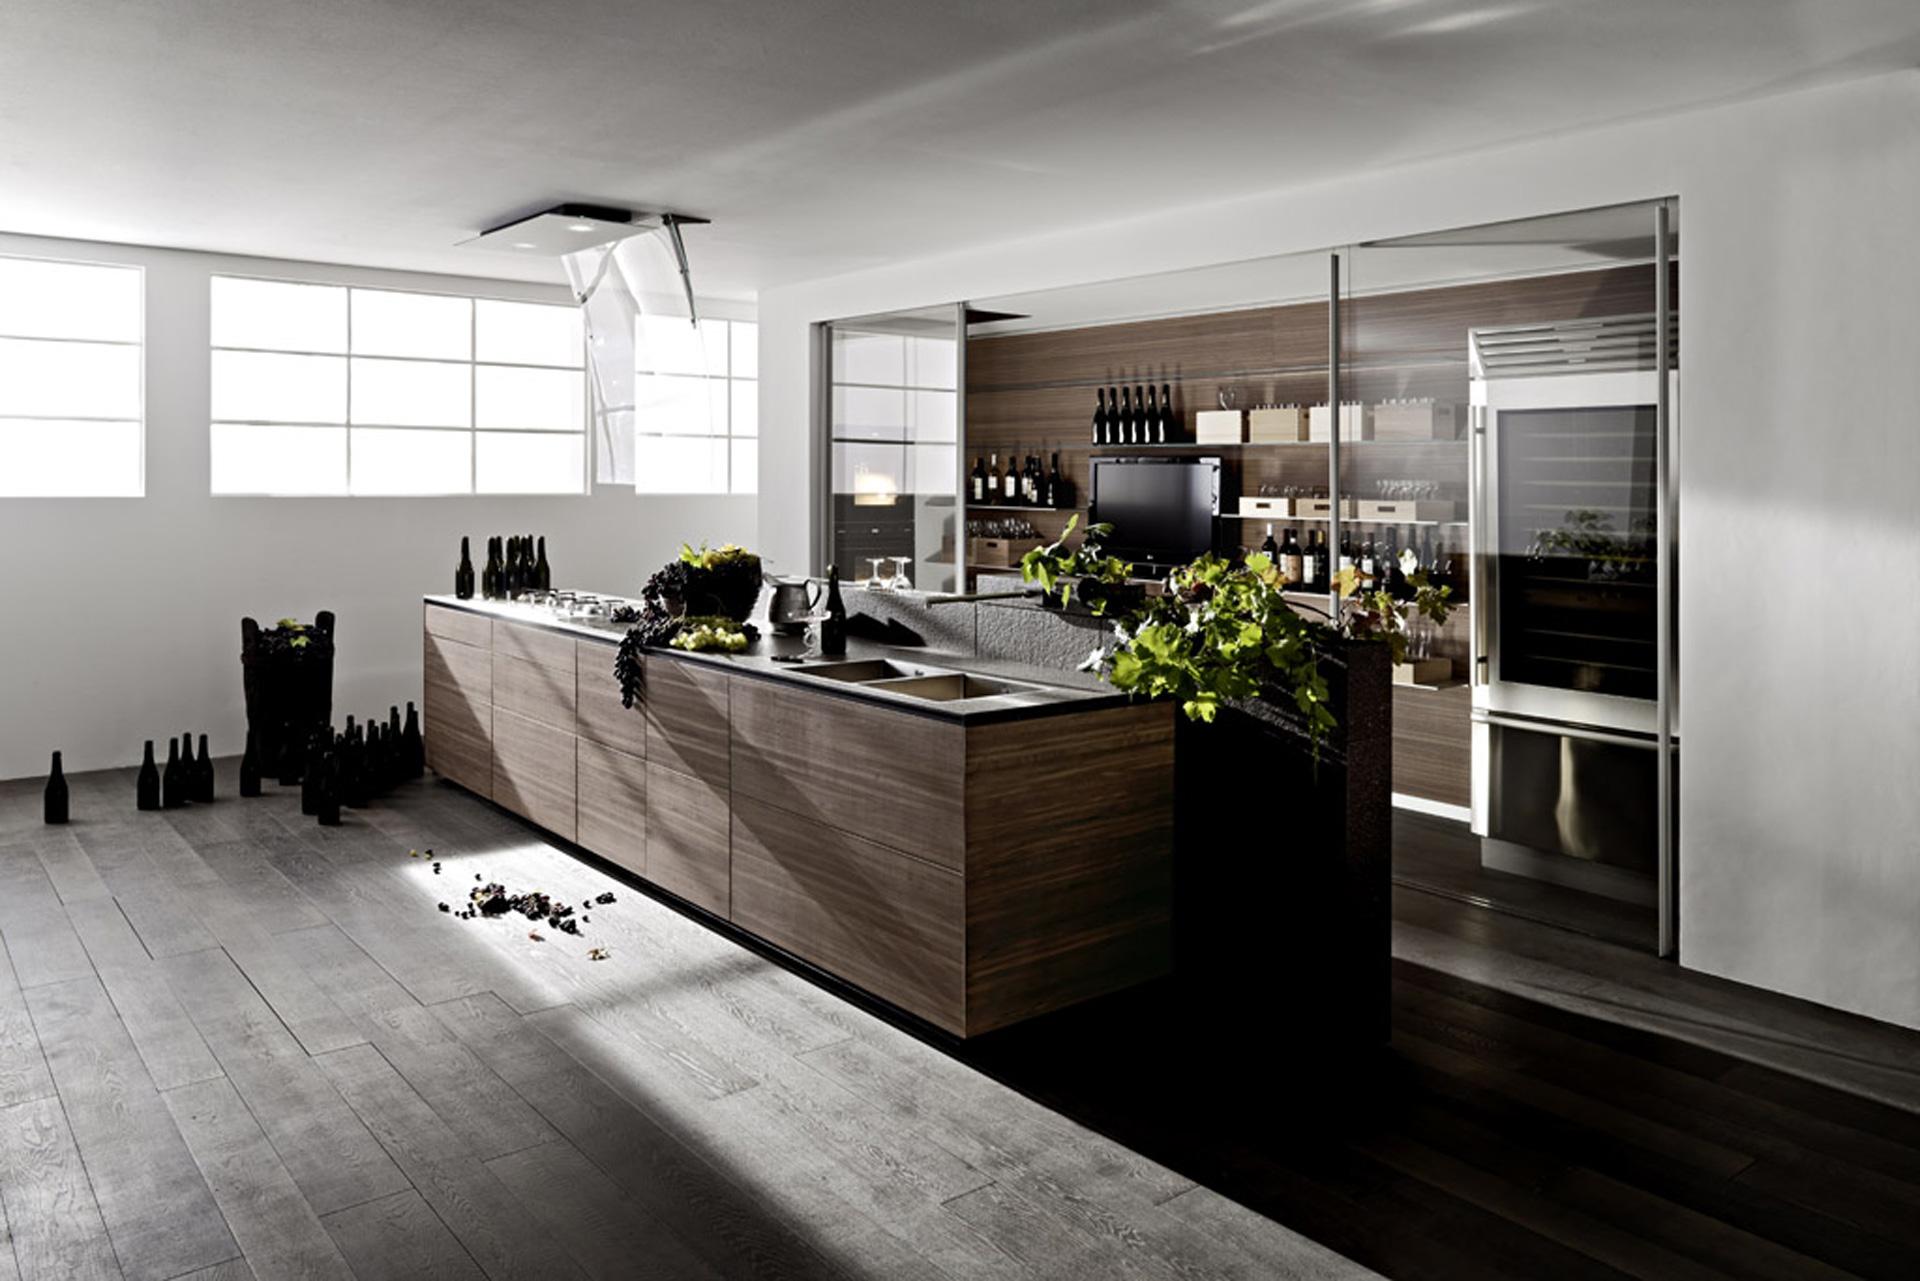 Best arredare casa arredo moderno arredo su misura for Soluzioni arredo